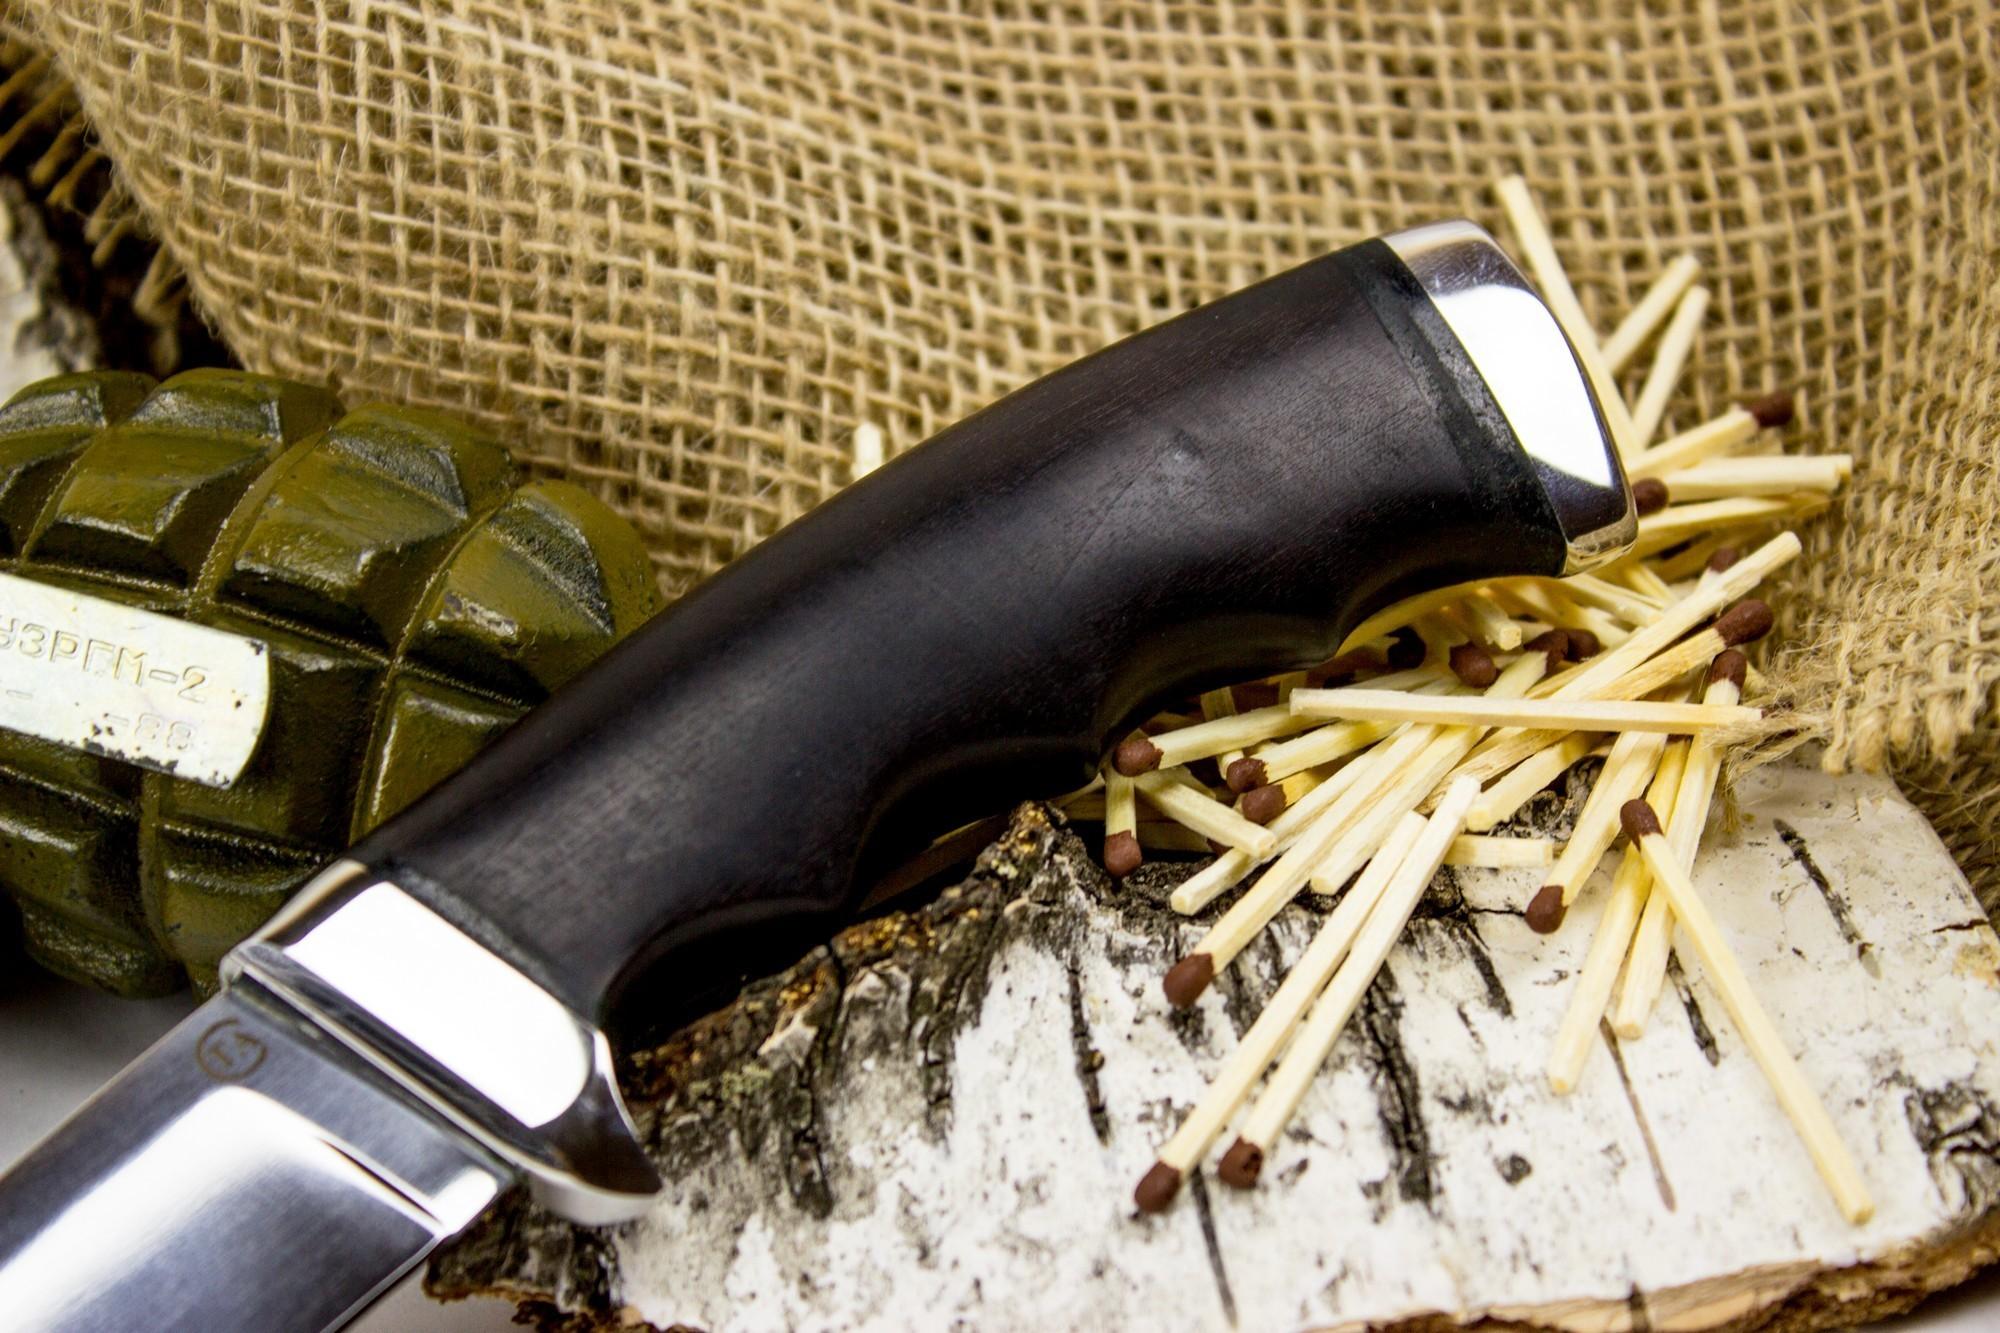 Фото 7 - Нож Кобра-3, сталь 95х18, дерево от Титов и Солдатова